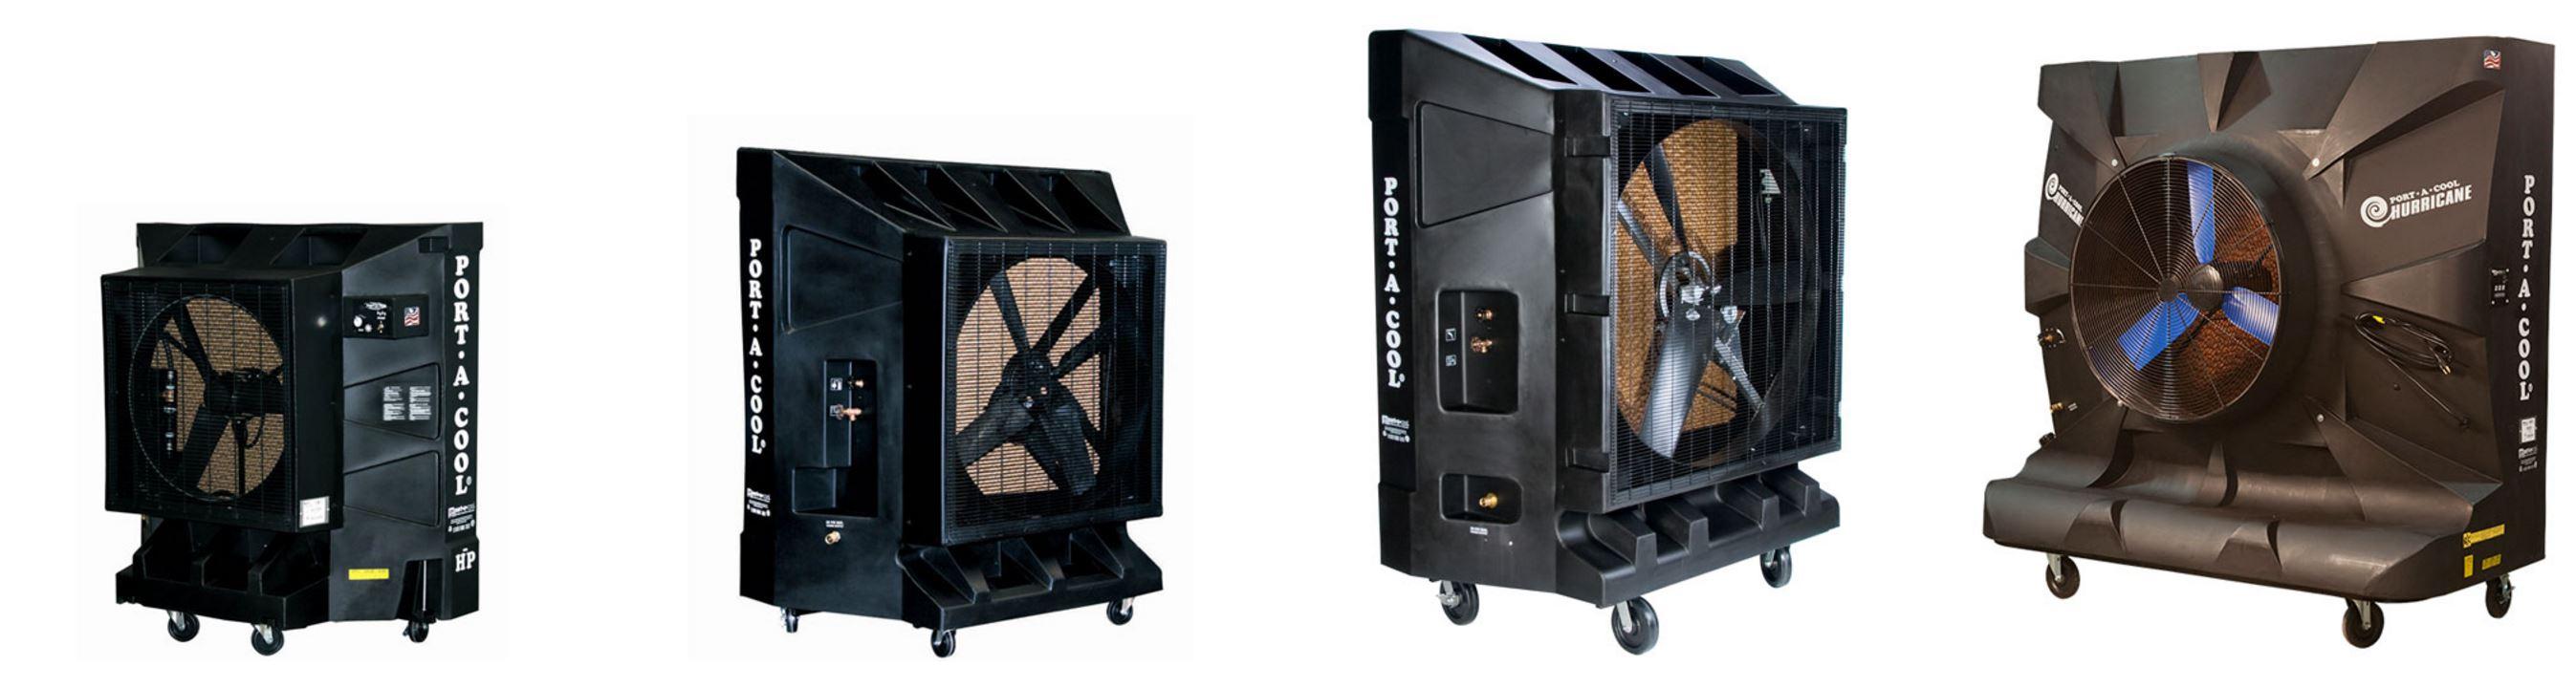 Portacool Portable Air Coolers – Patio cooler